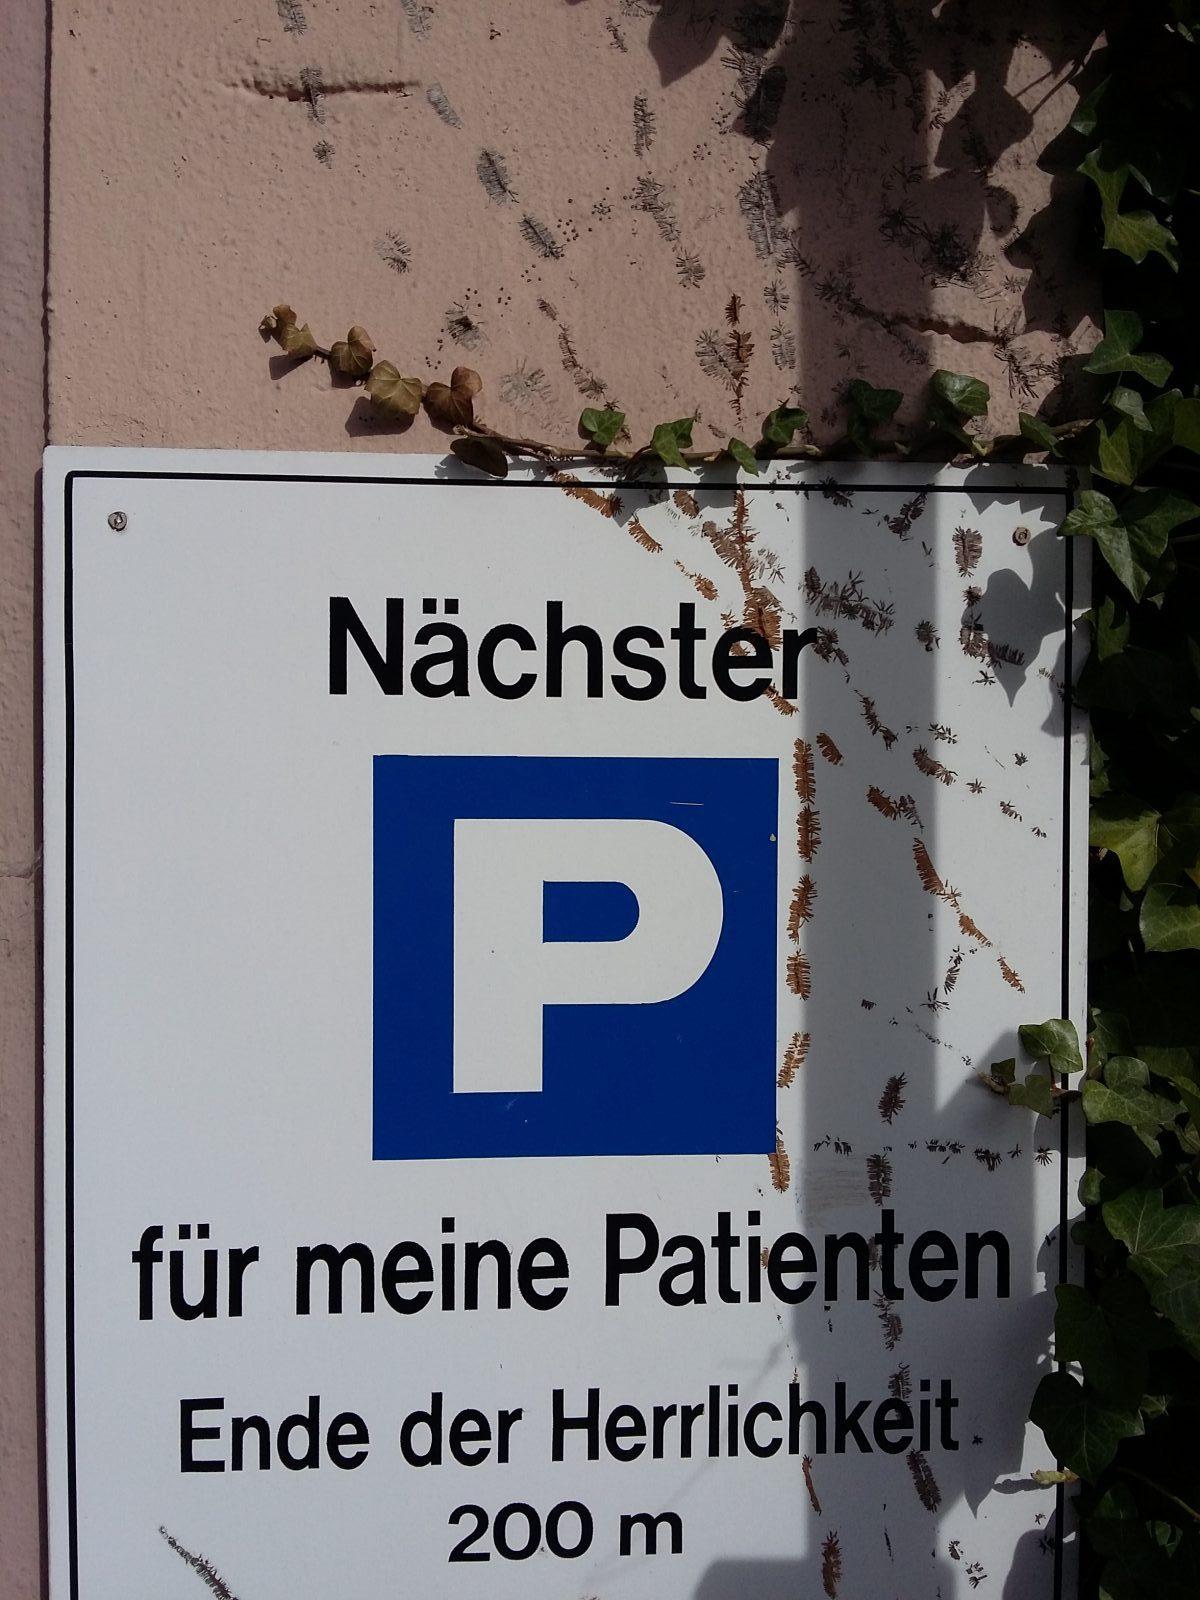 Servicepionier_Servicekomplize_Armin_Nagel_Orte_des_Grauens_Parkplatz (59)